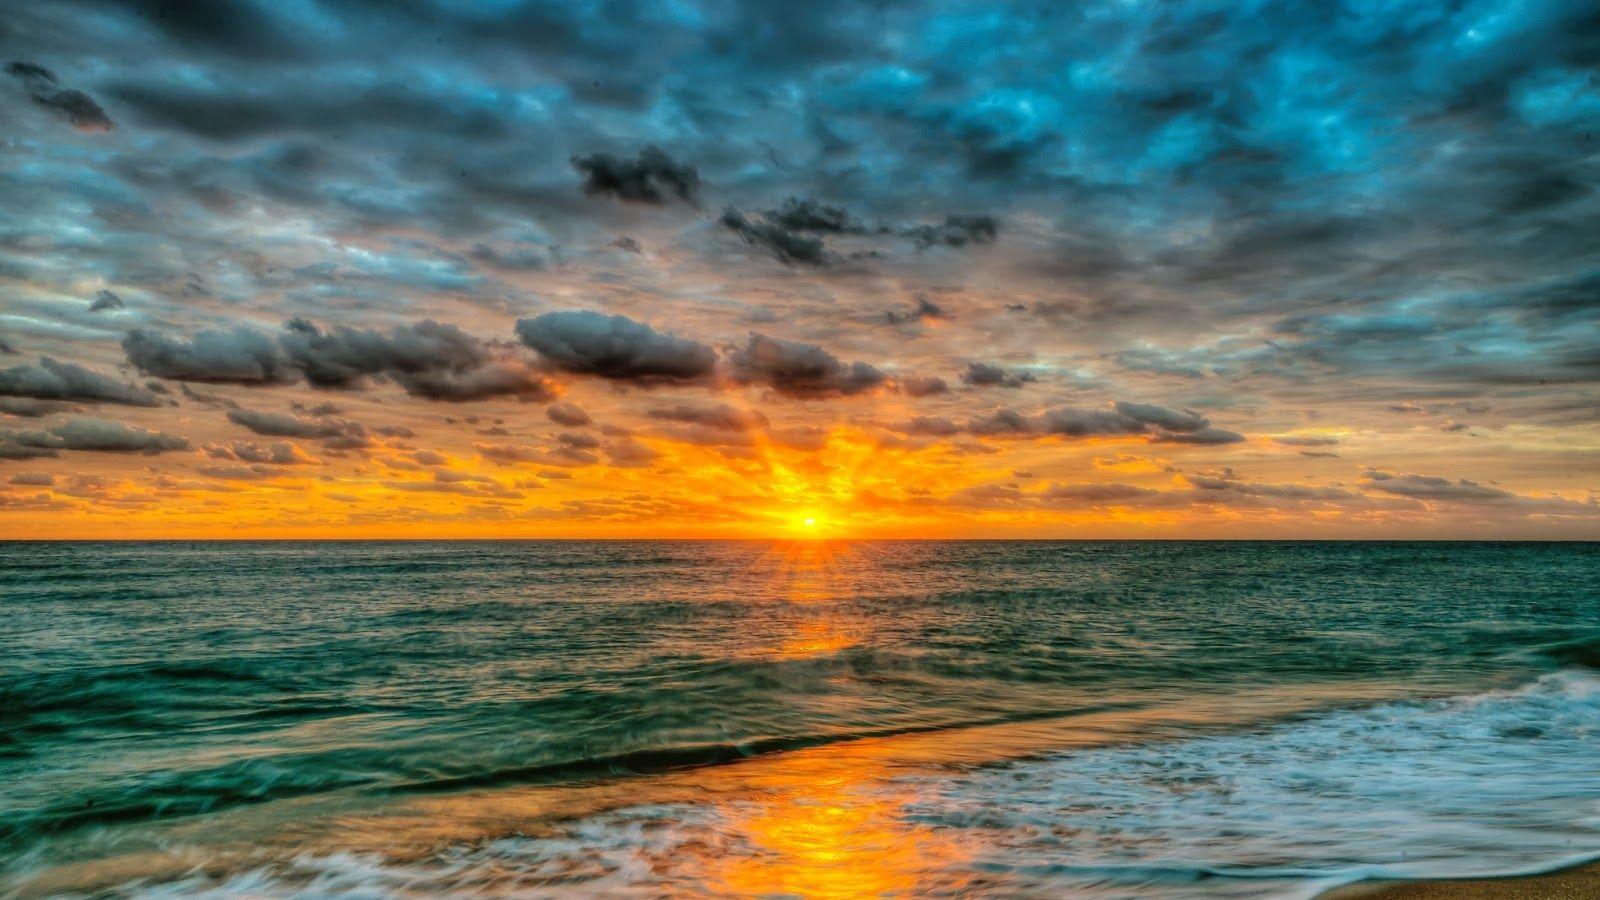 Beautiful Sunrise Hd Summer Landscape Landscape Wallpaper Sunrise Landscape